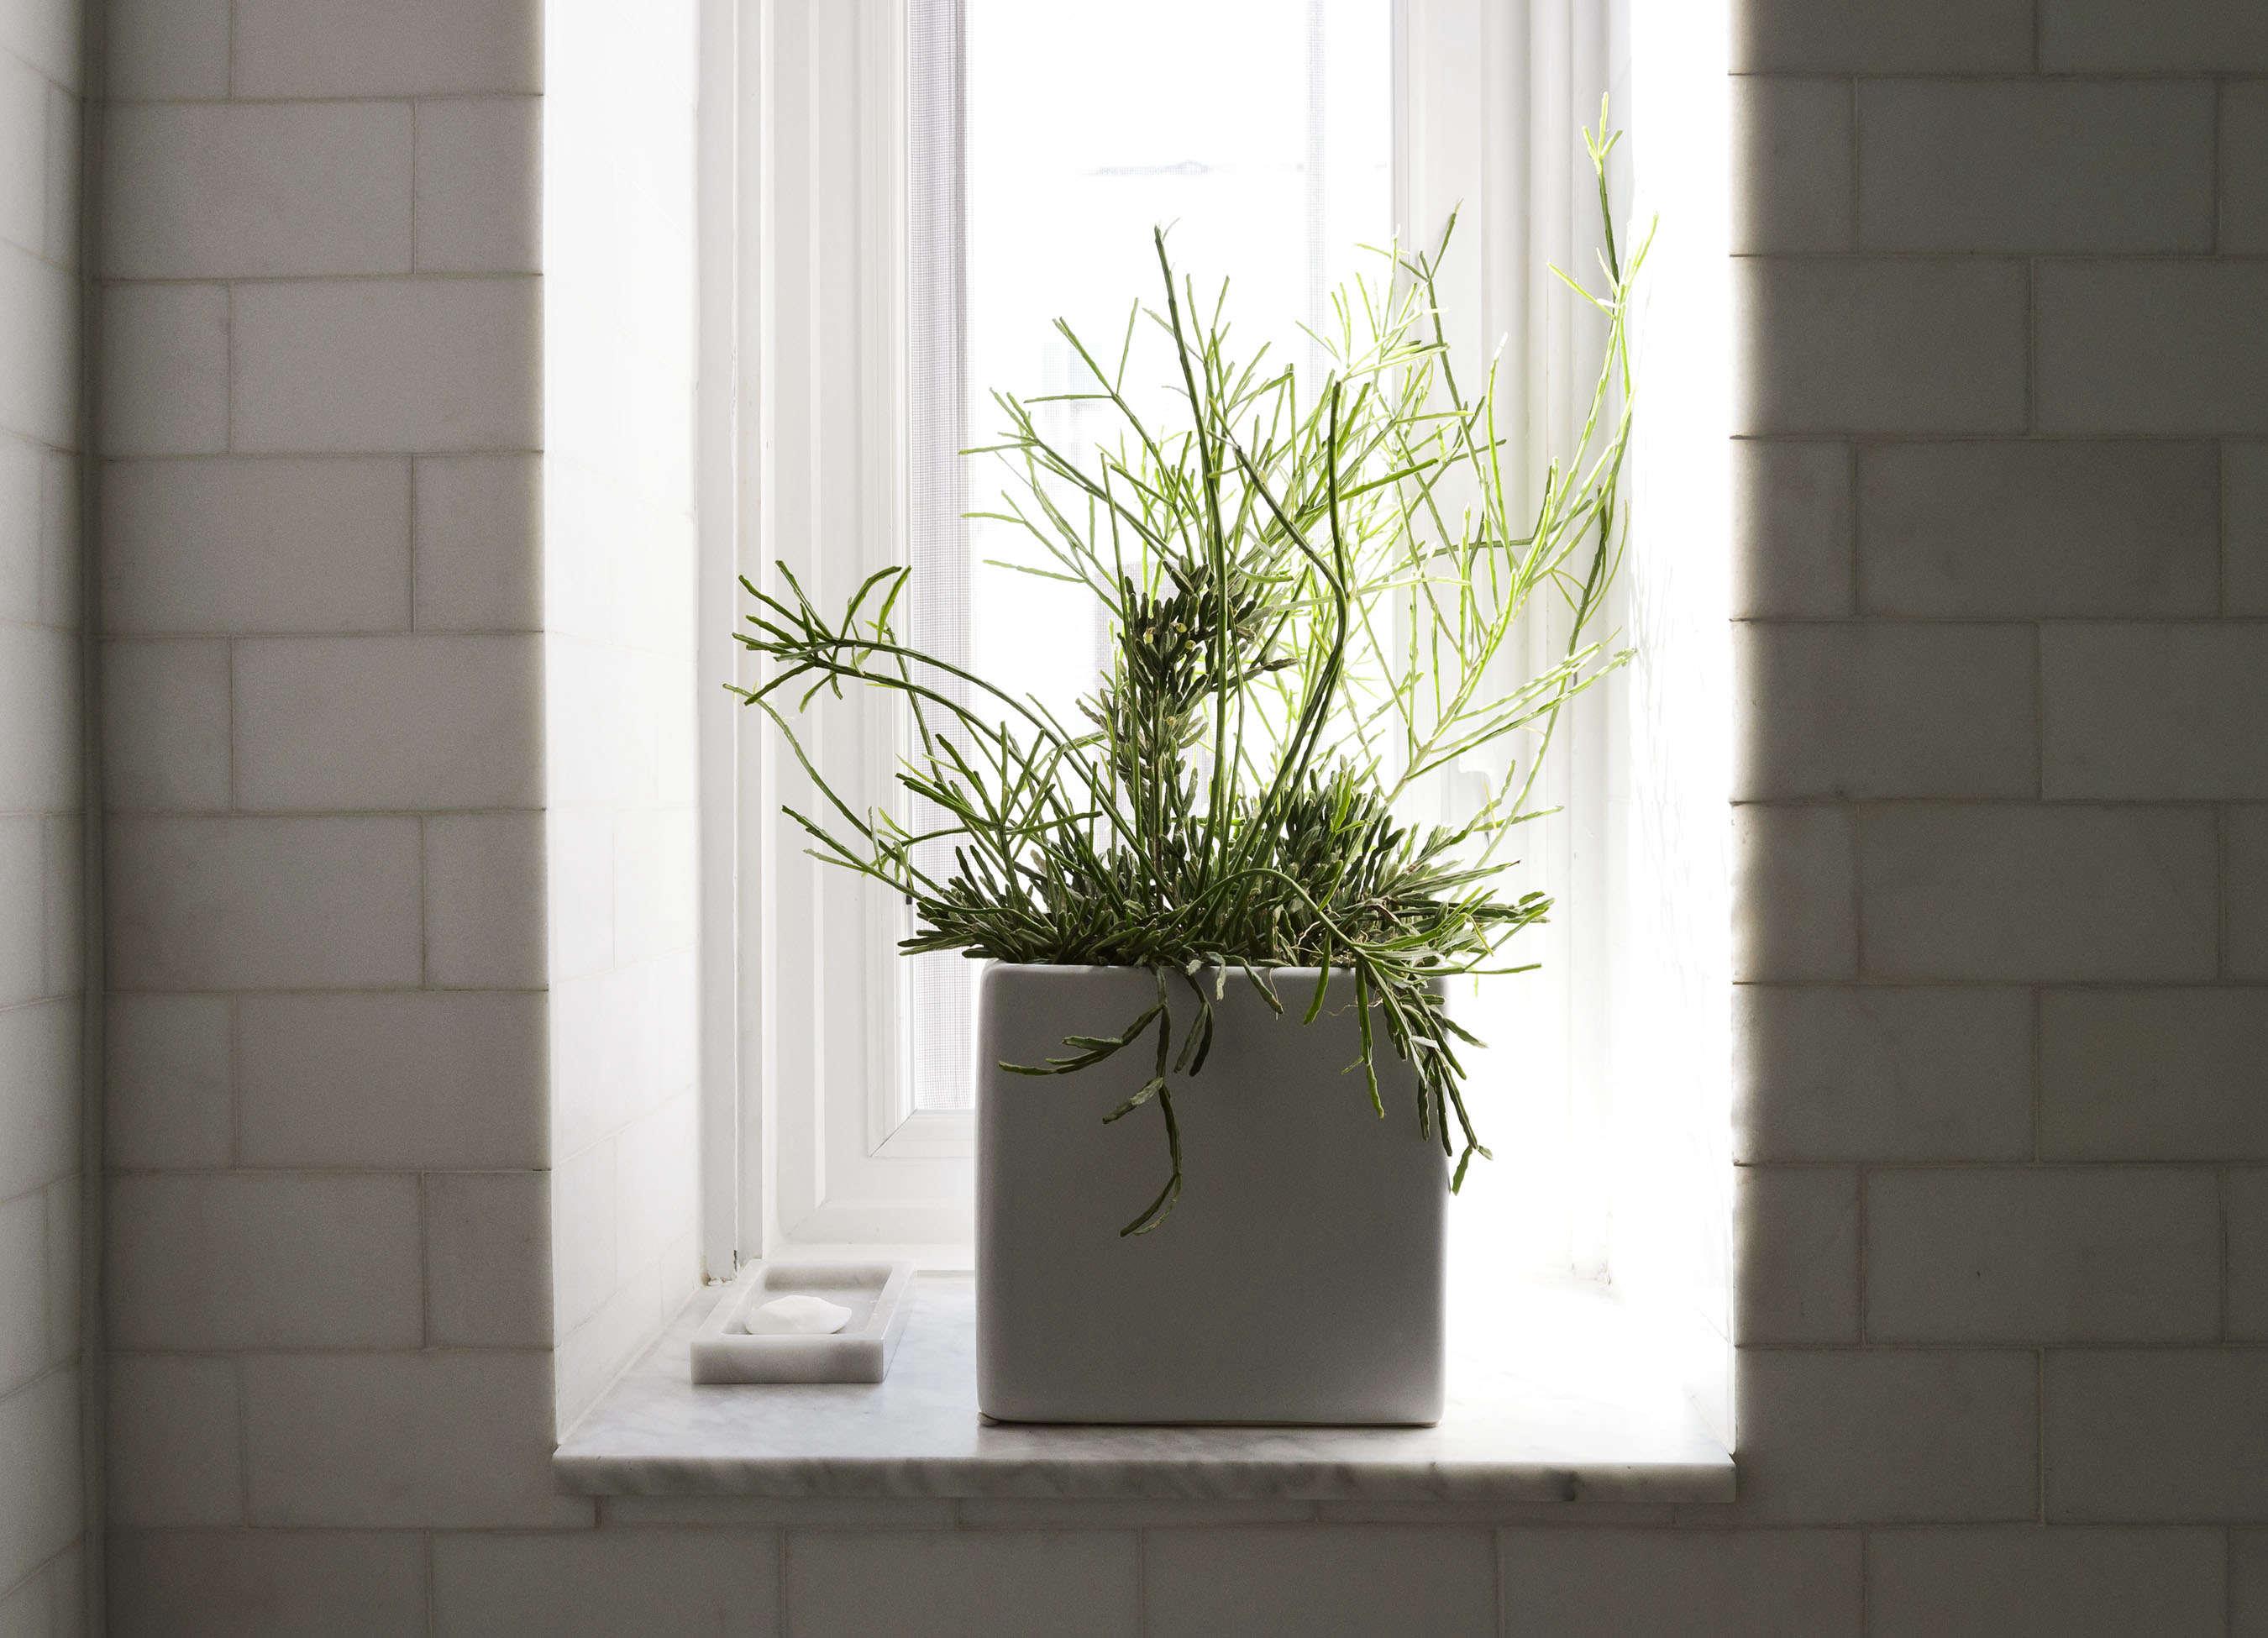 Plant on bathroom windowsill in Jacqueline-Schmidt and David Friedlander's 675-square-foot Brooklyn quarters, Matthew-Williams-photo | Remodelista